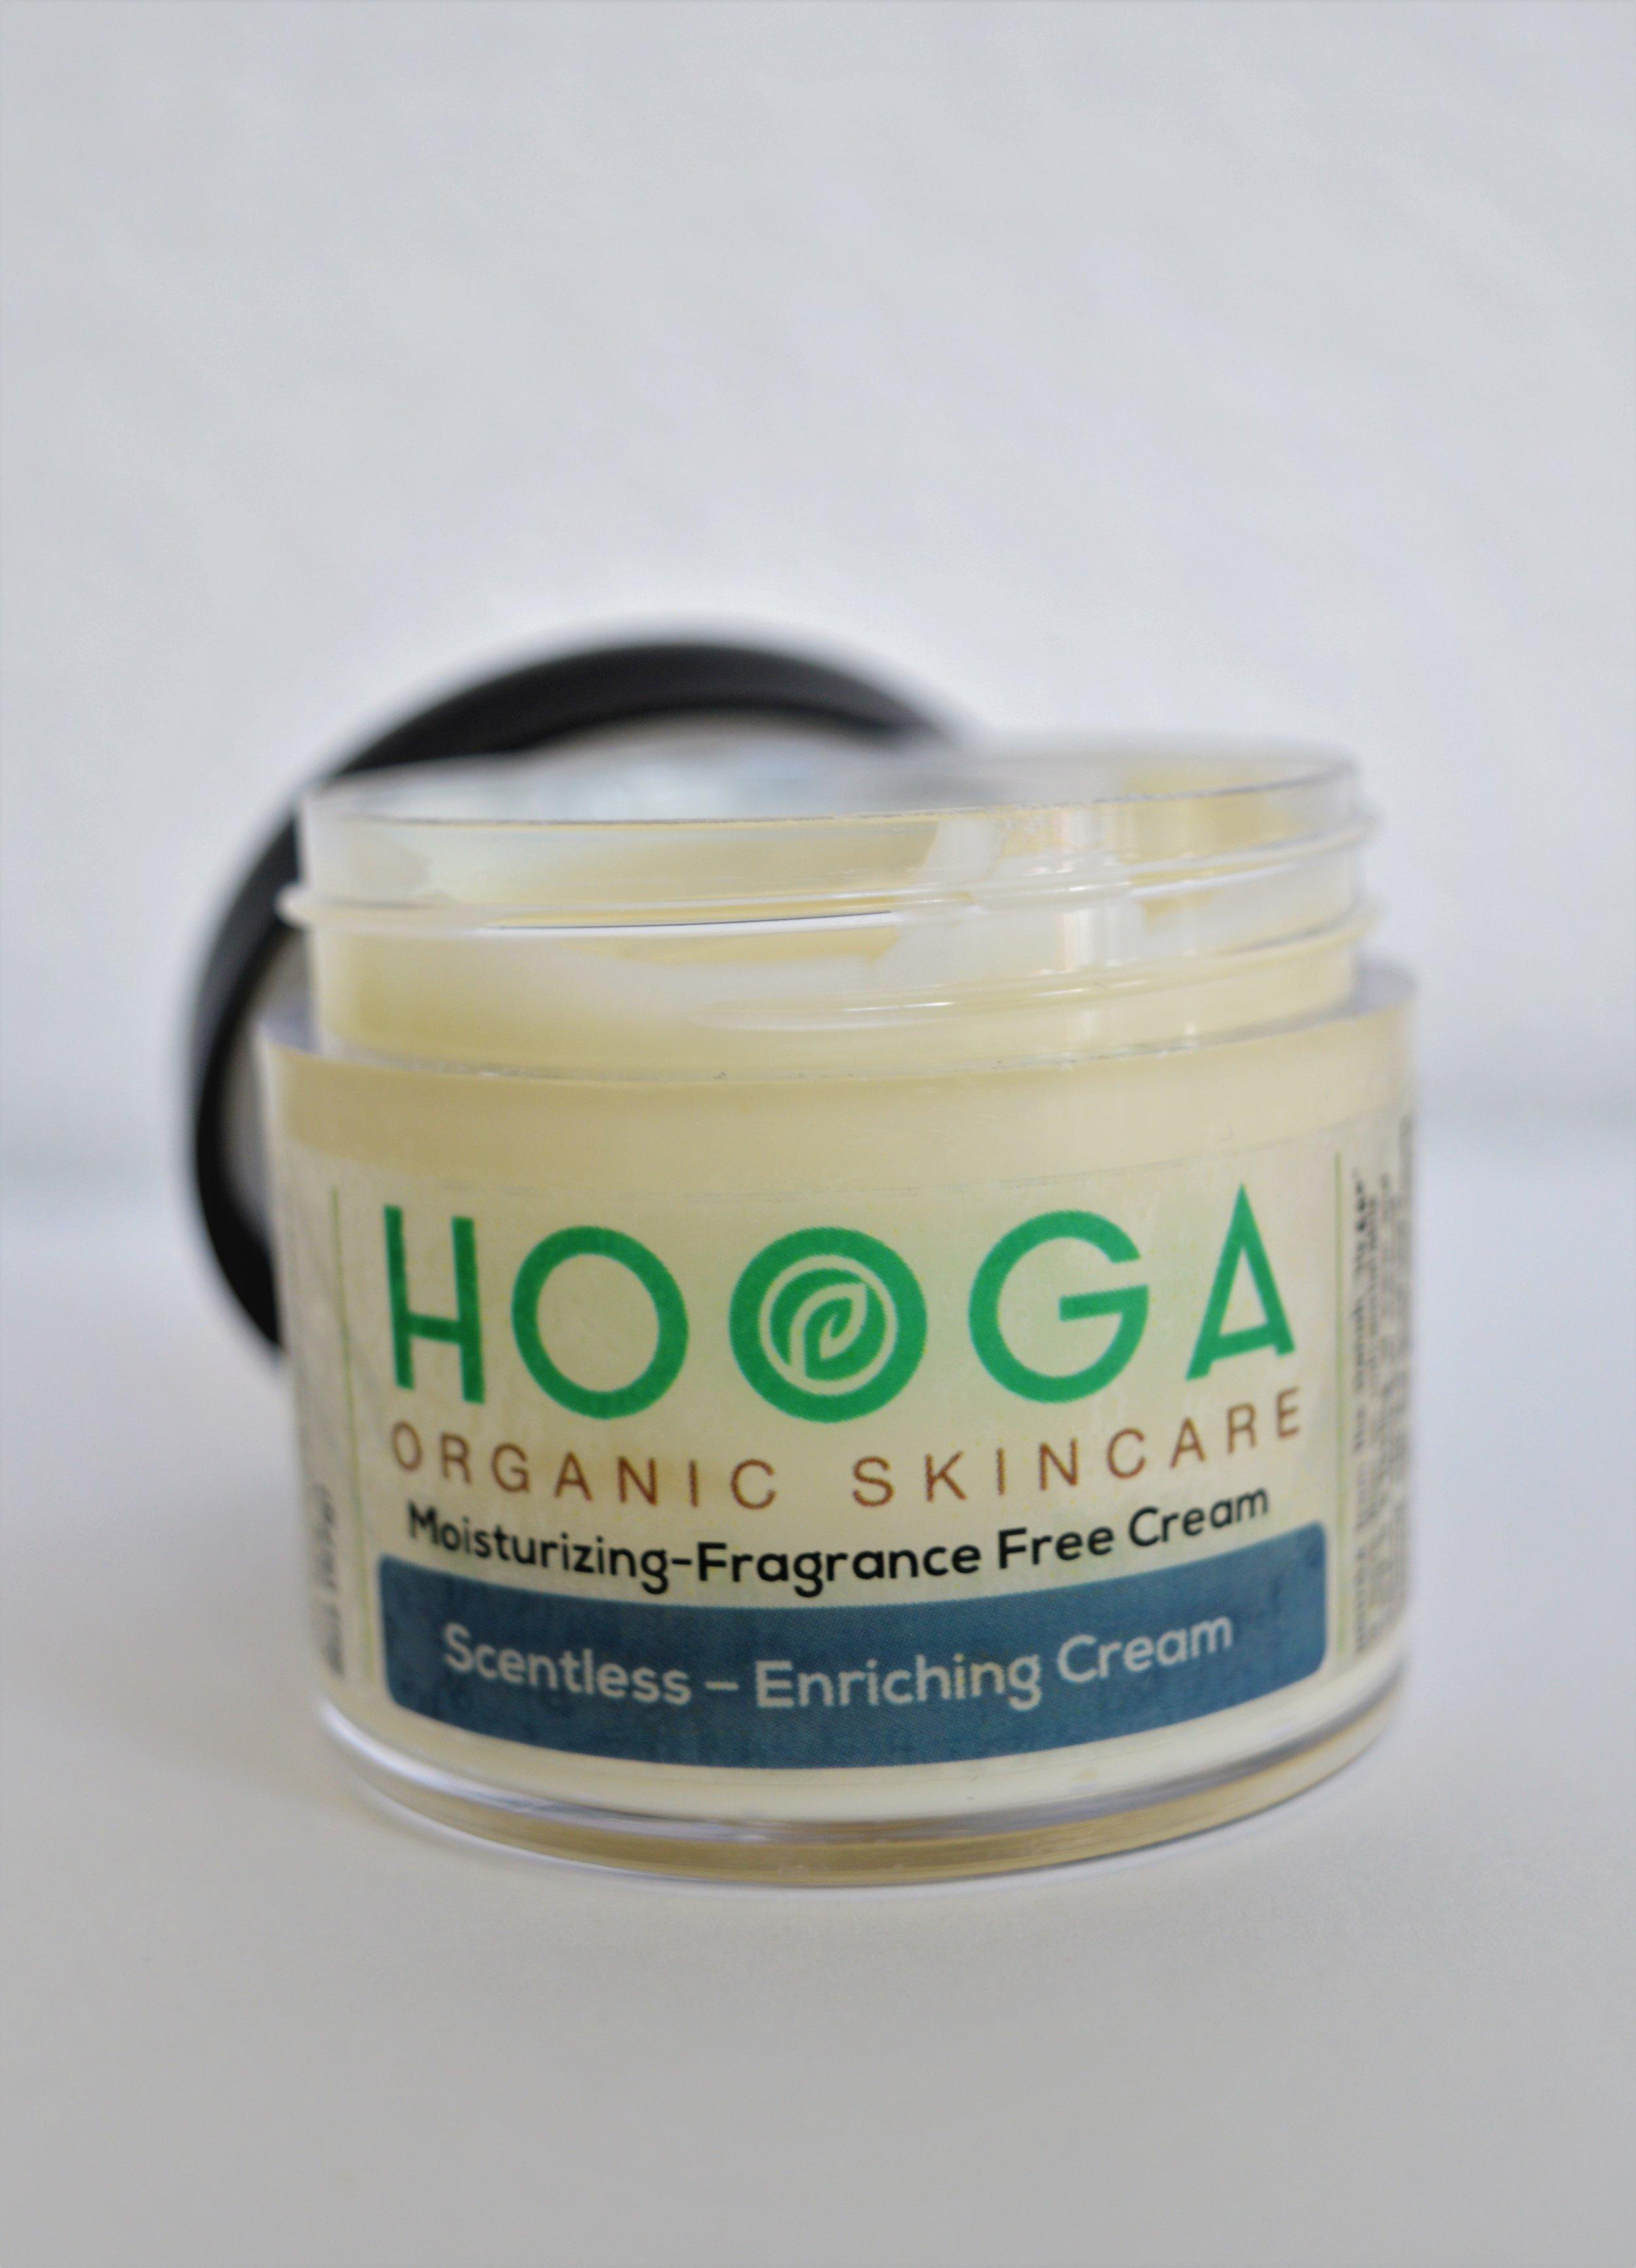 Fragrance free cream - Scentless.jpg